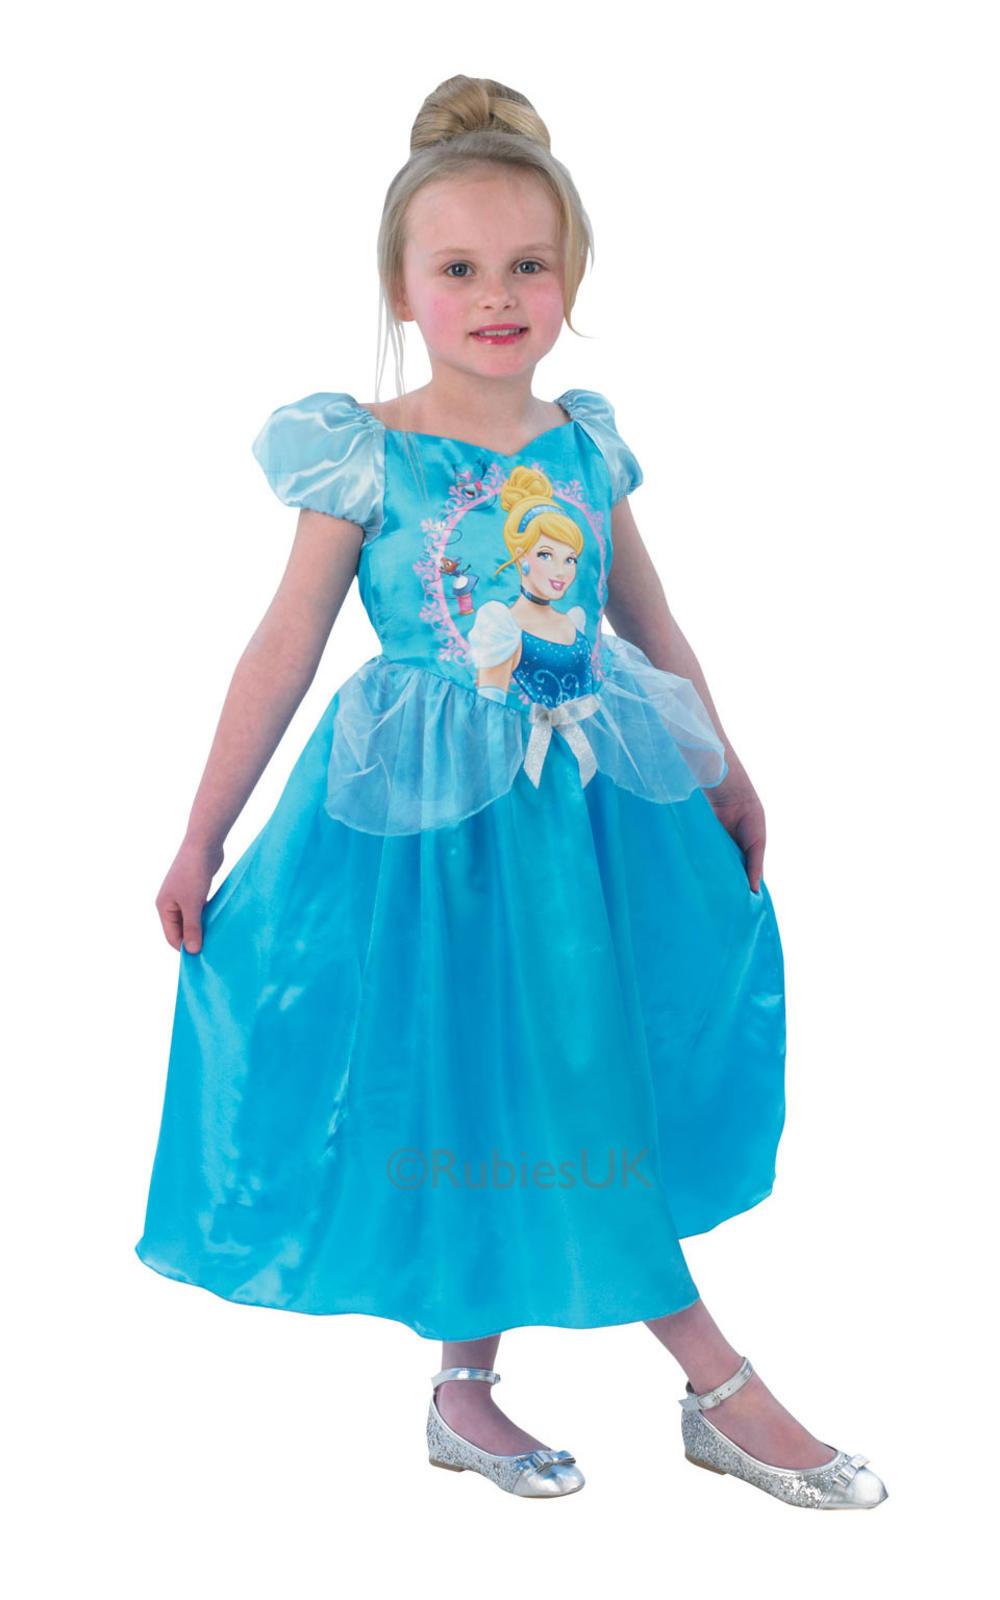 Cinderella Princess Girls Fancy Dress Disney Fairytale Kids Child Costume Outfit